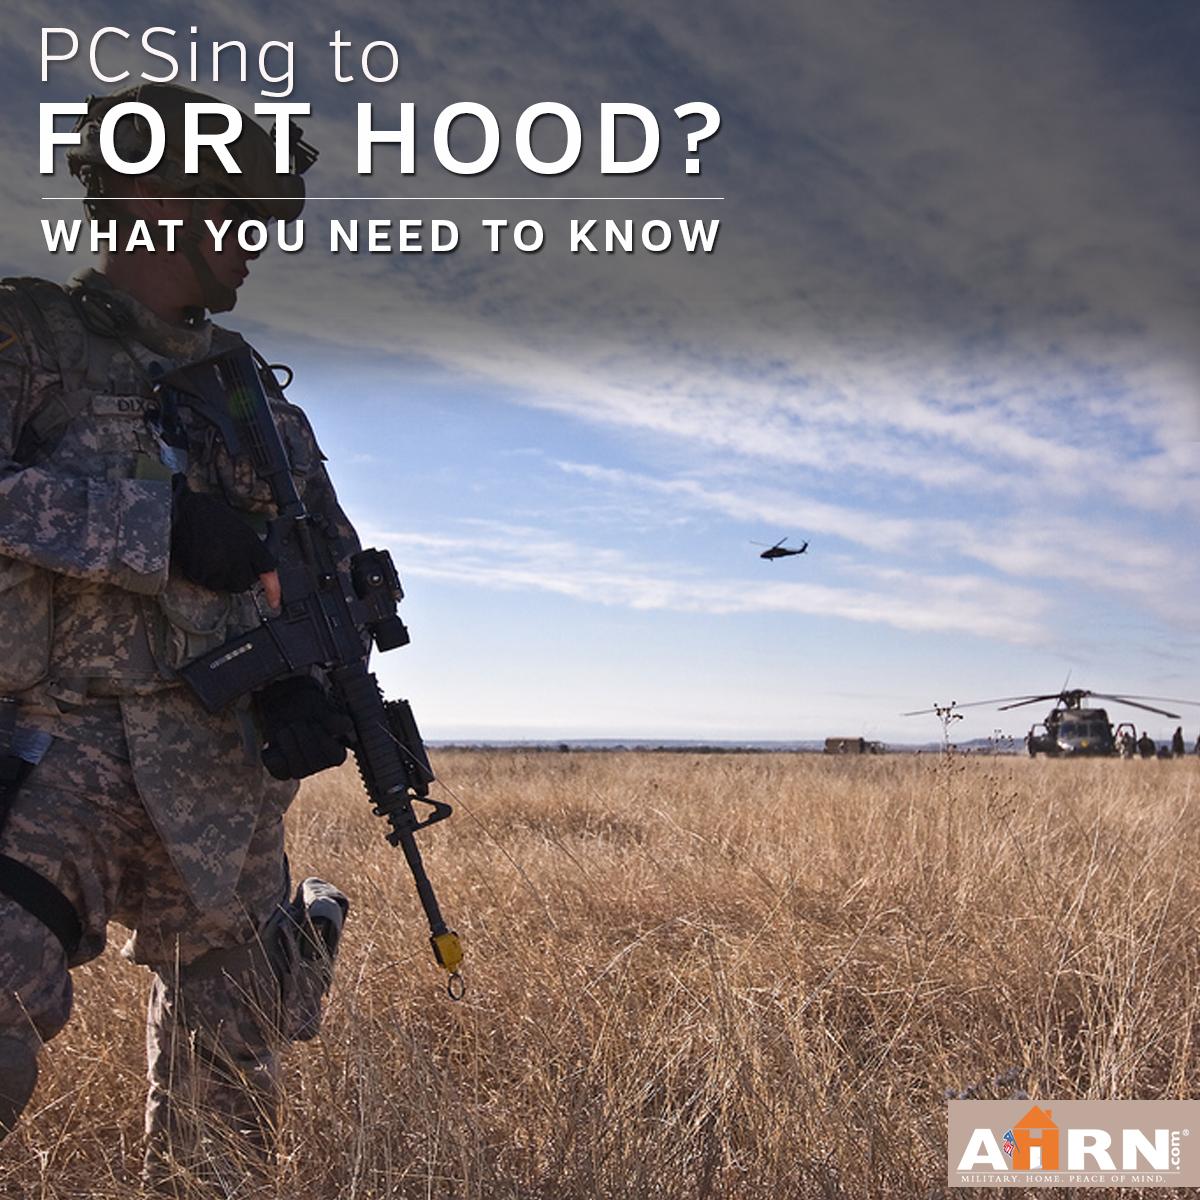 fort hood tx weather